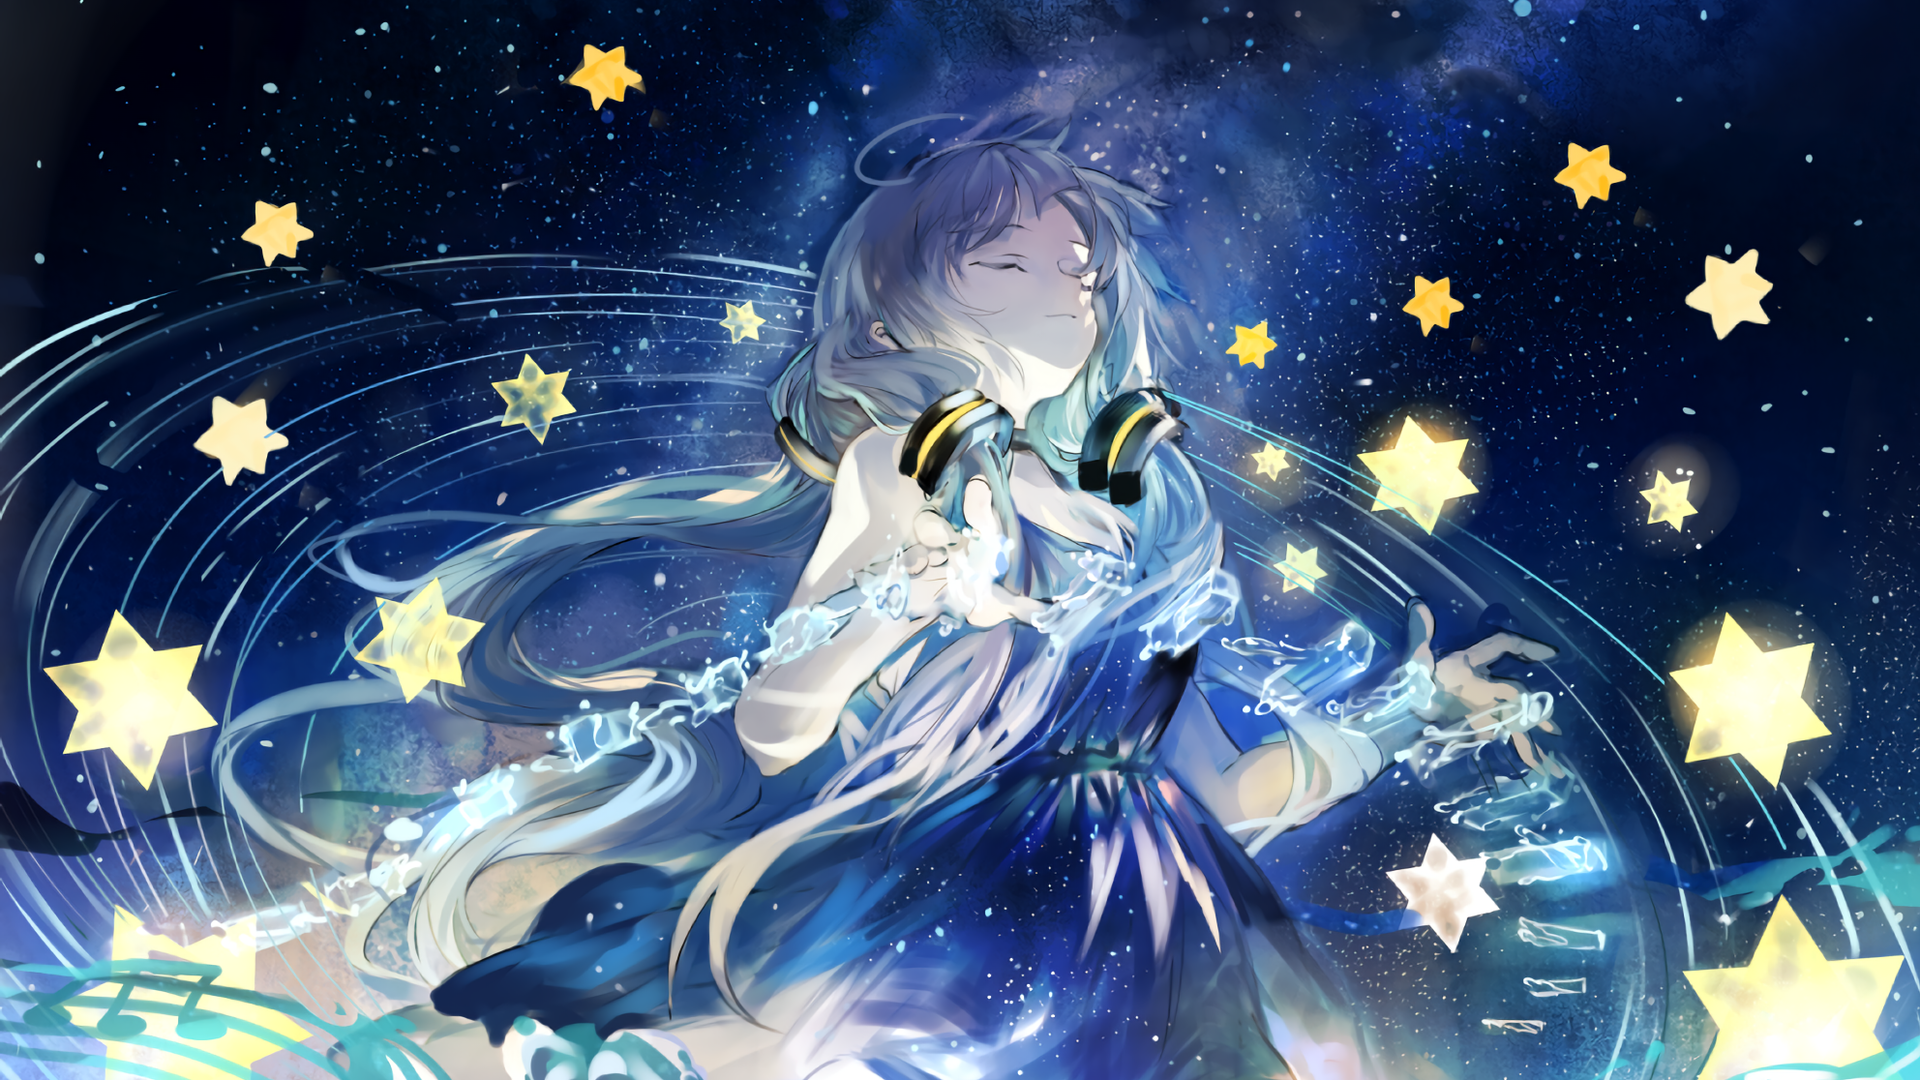 30] Star Girl Desktop Wallpaper on WallpaperSafari 1920x1080